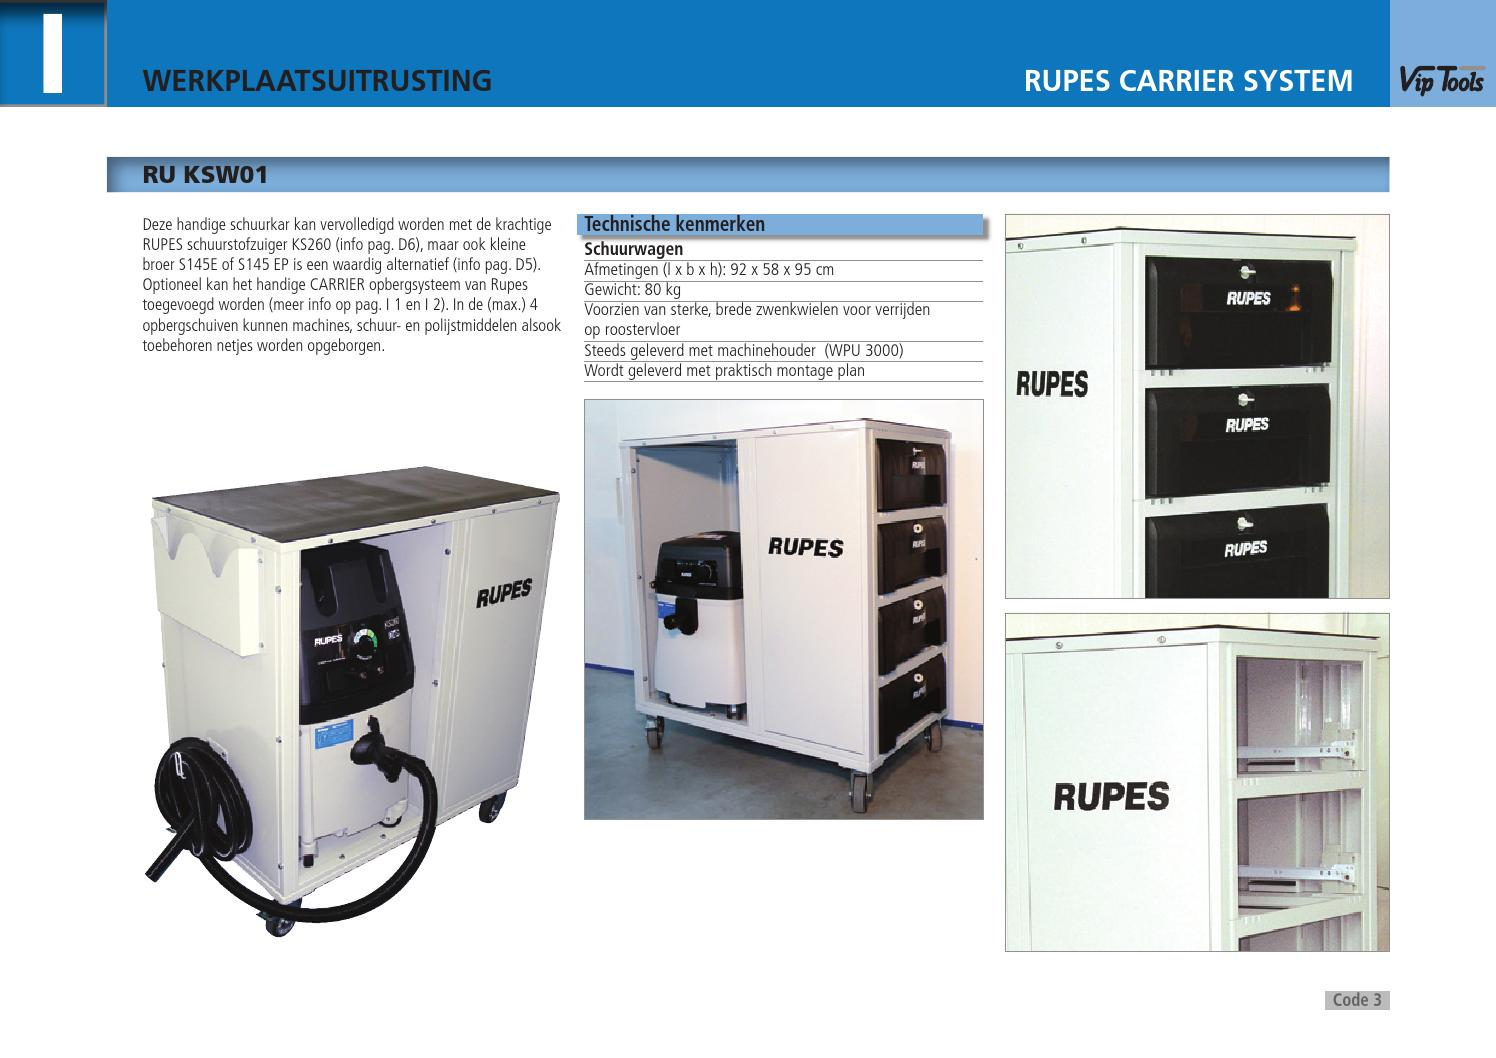 Rupes werkplaatsuitrusting by de maesschalck h nv issuu for Opbergsysteem schuur